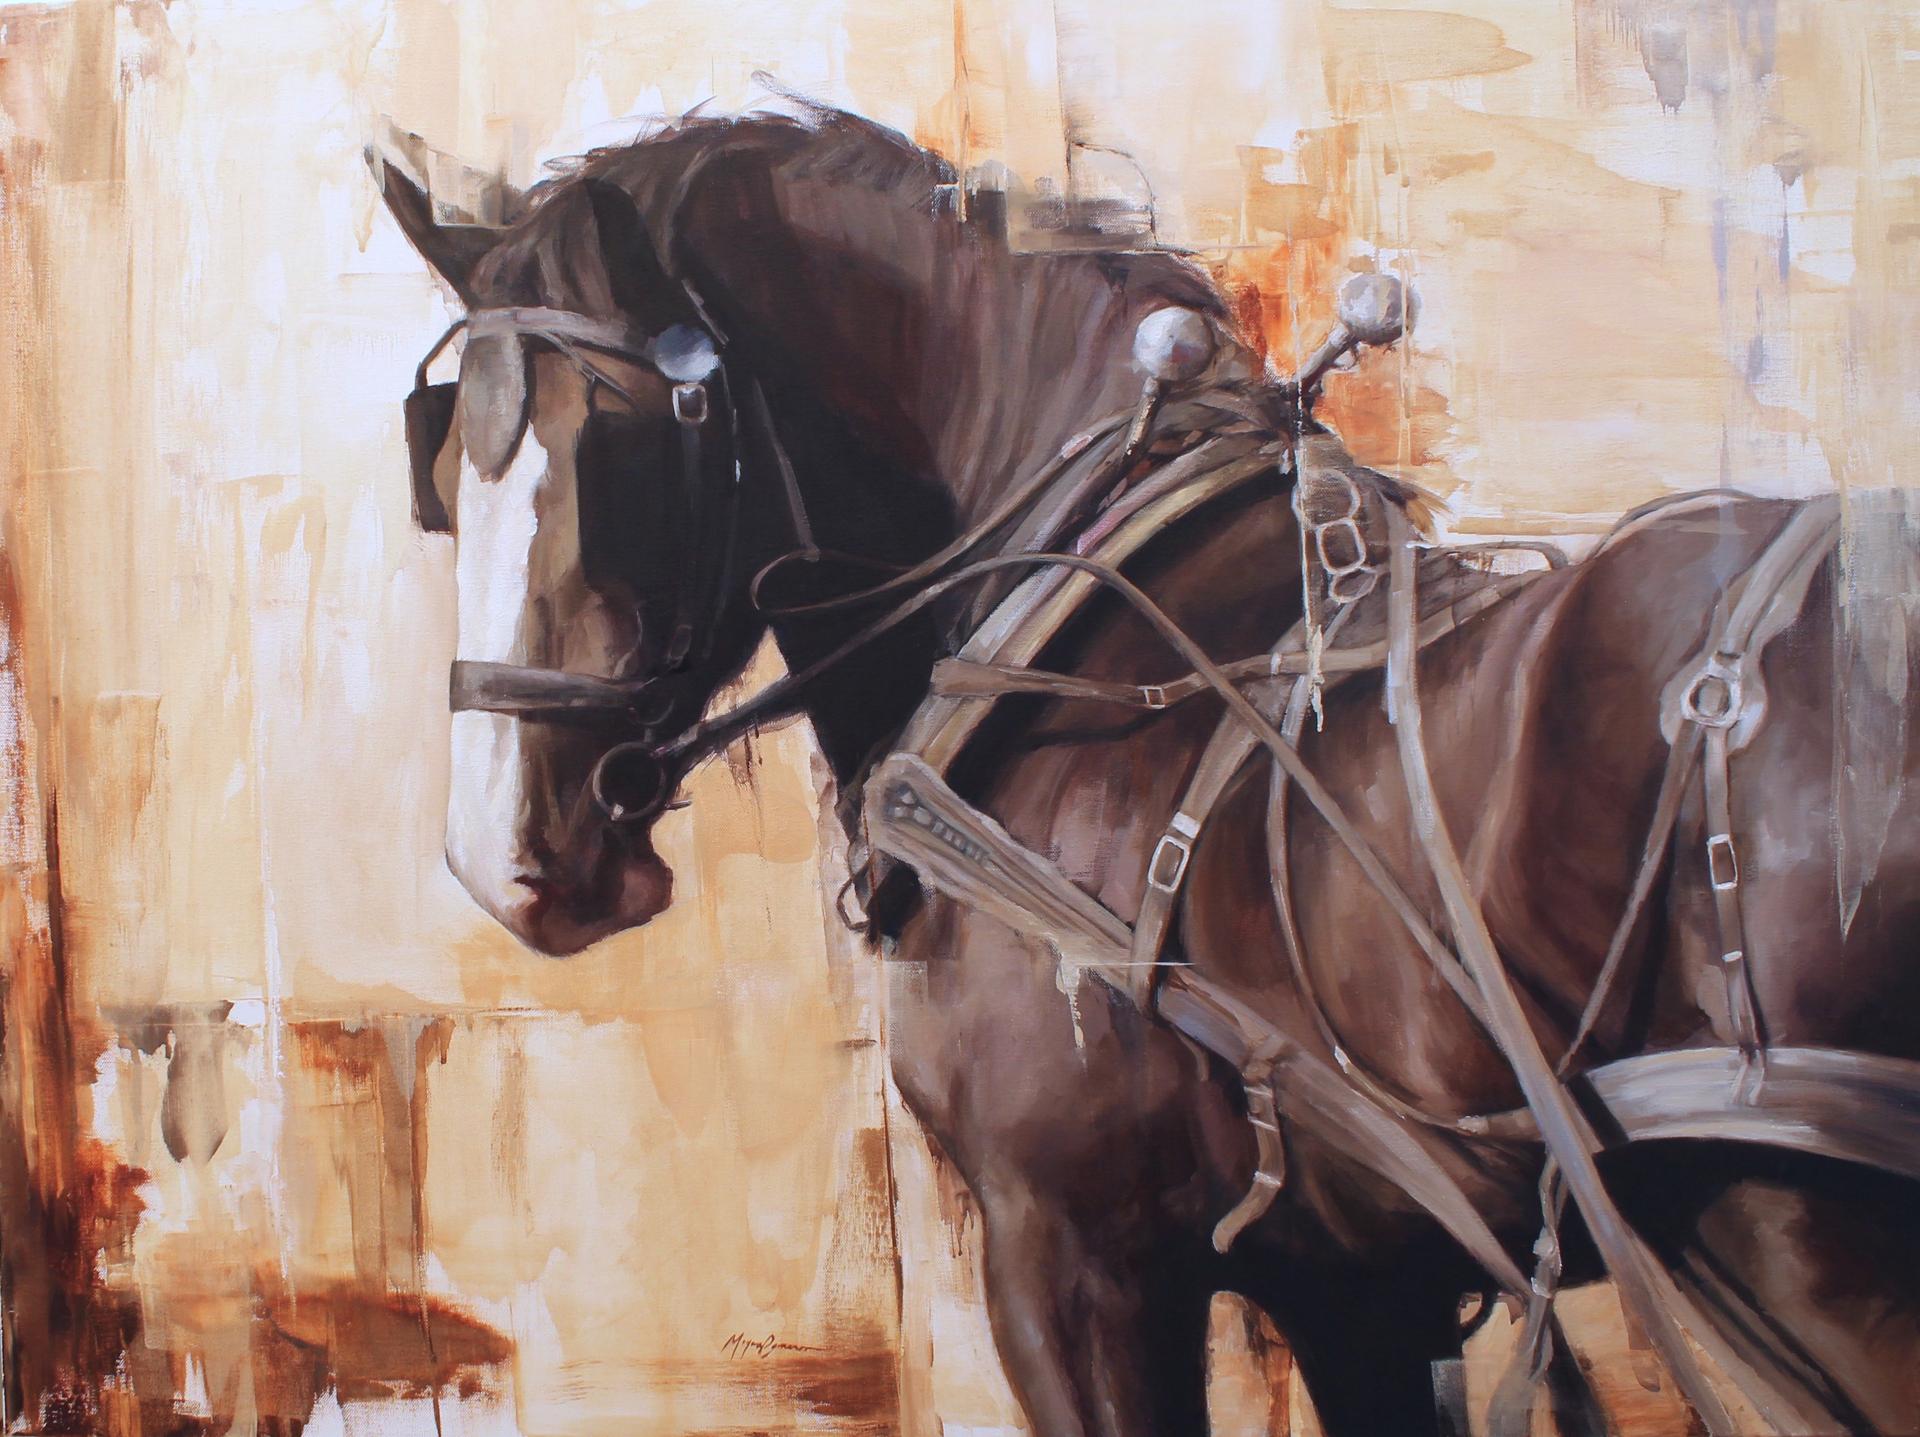 The Shire by Morgan Cameron